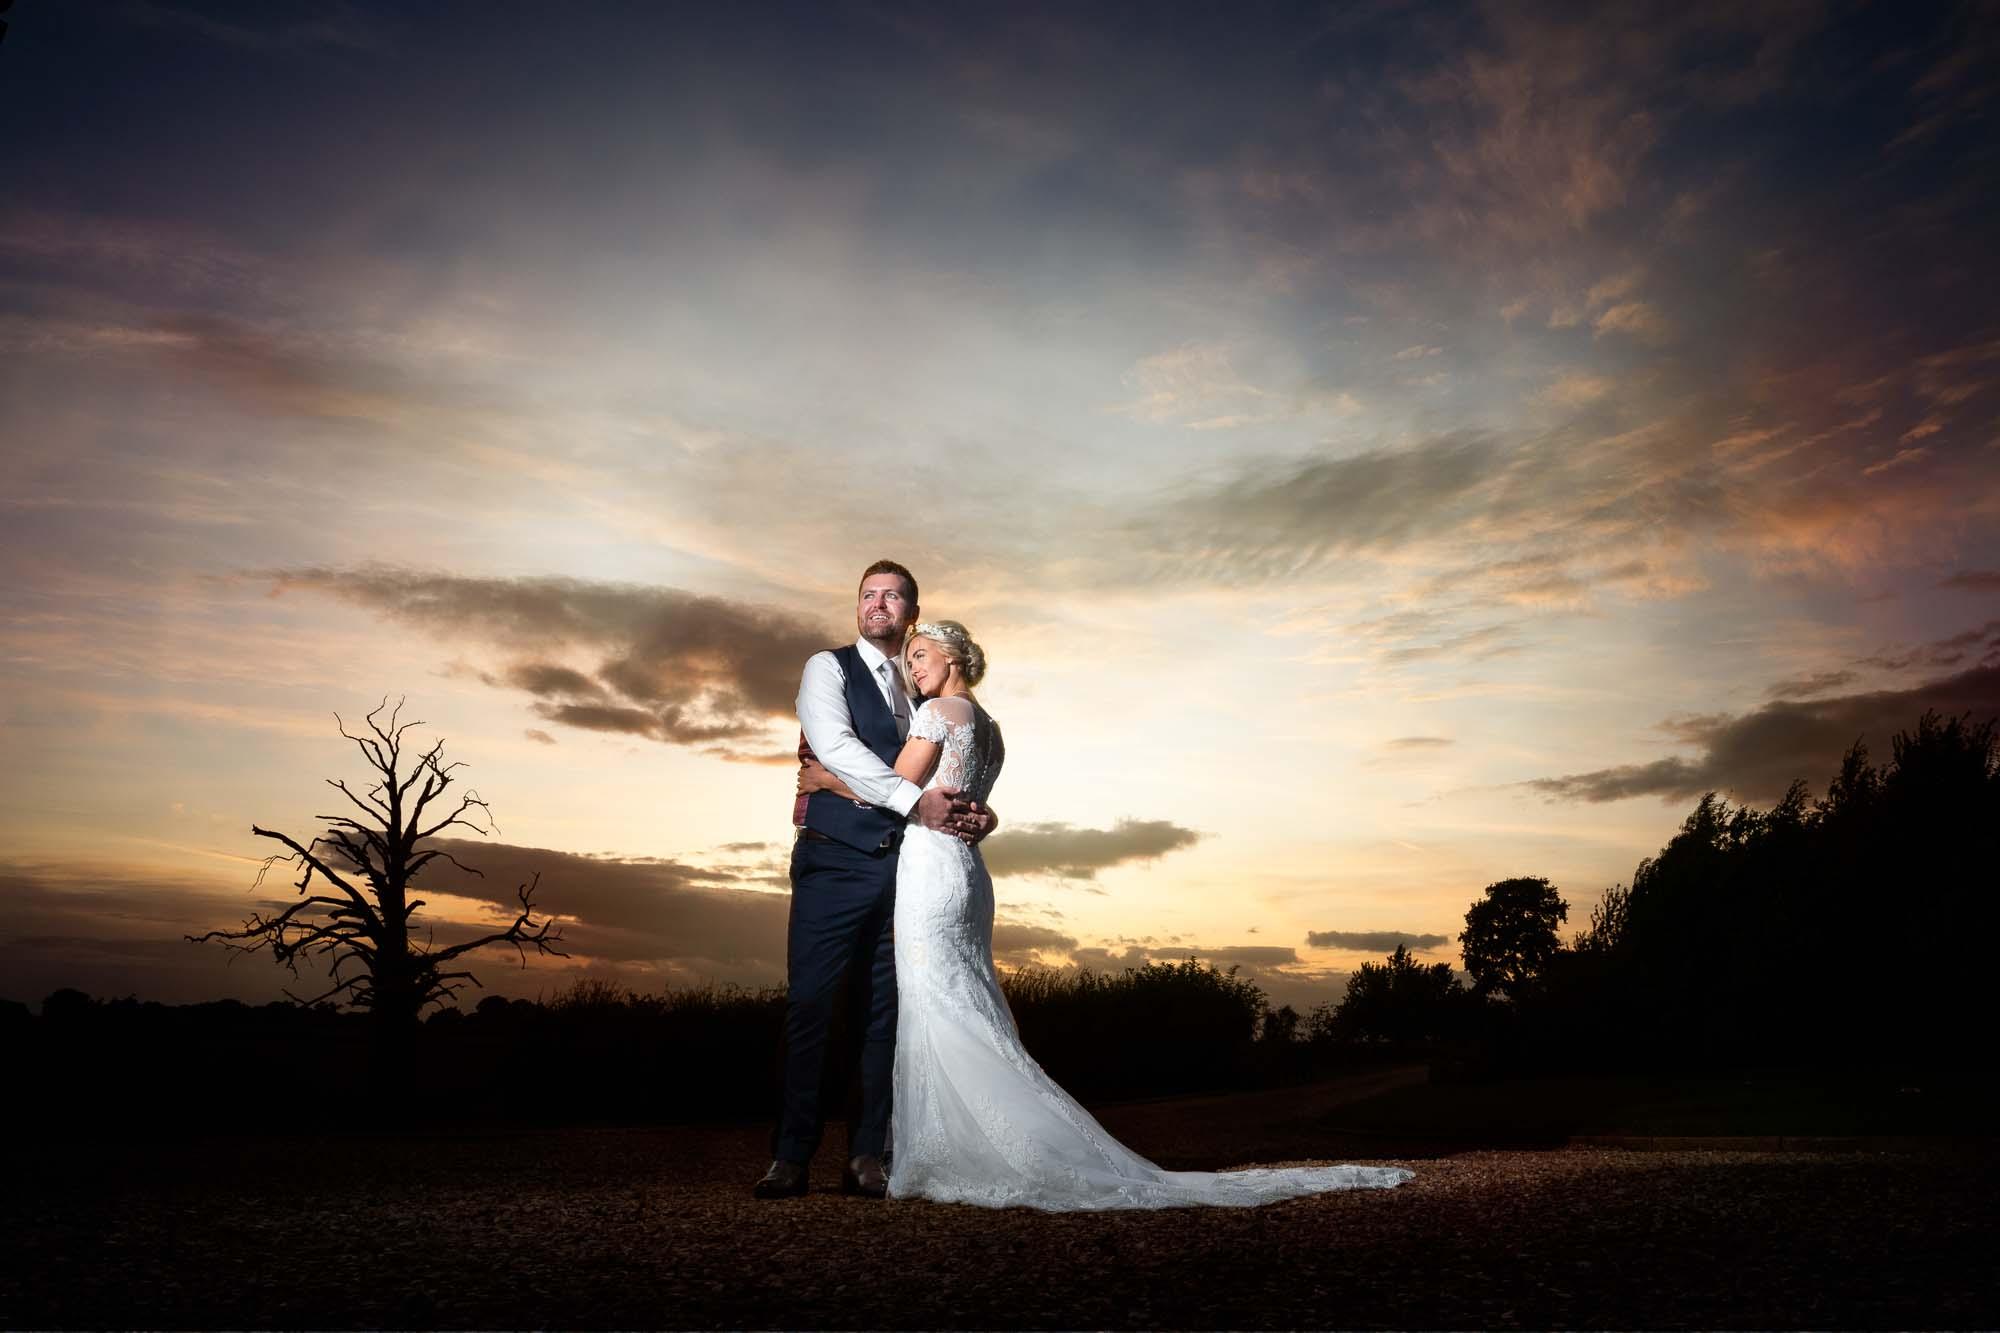 York sunset wedding photography